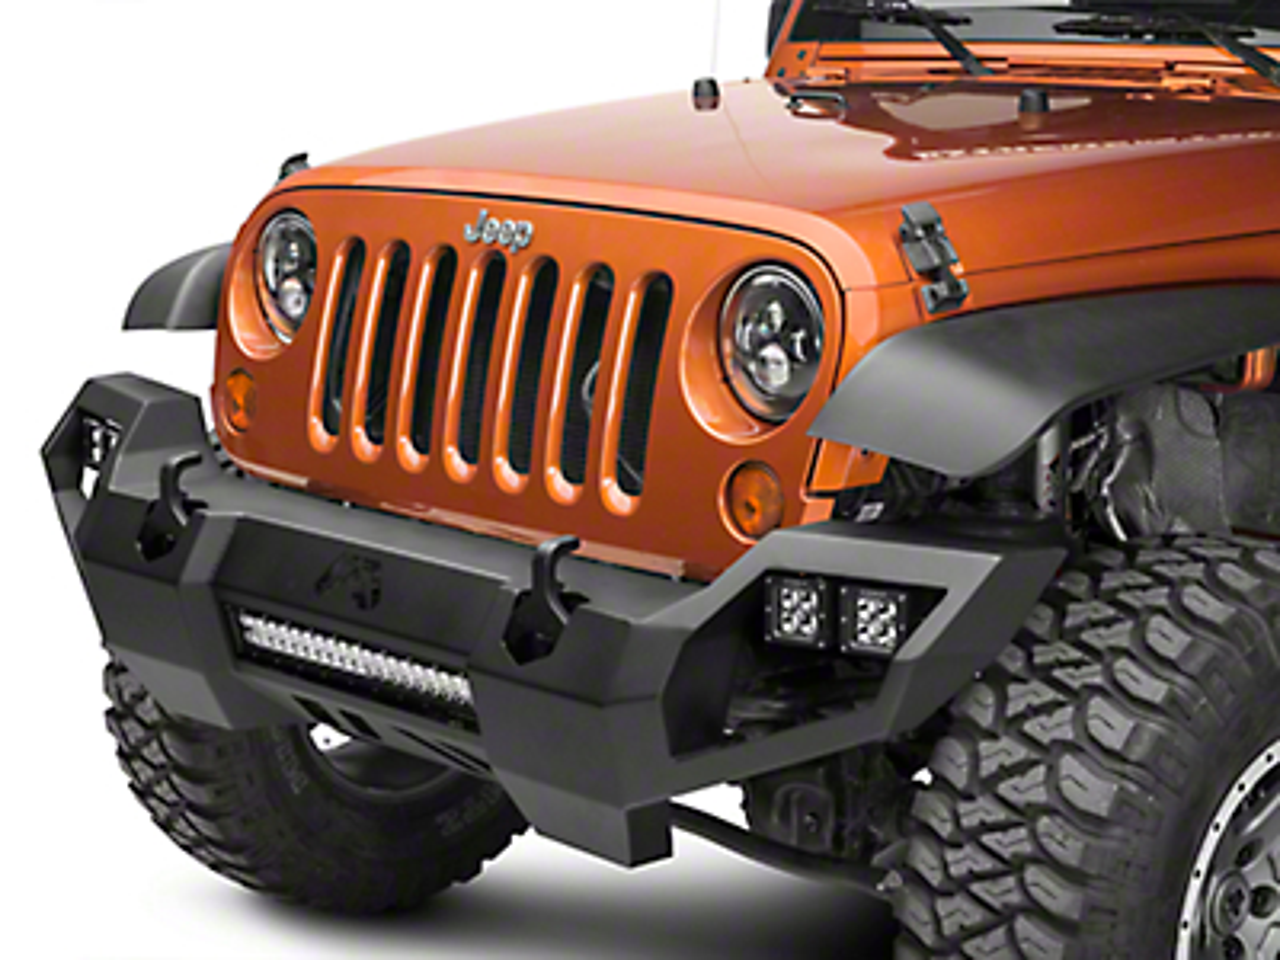 Fab Fours Vengeance Front Bumper w/ No Guard (07-18 Jeep Wrangler JK)